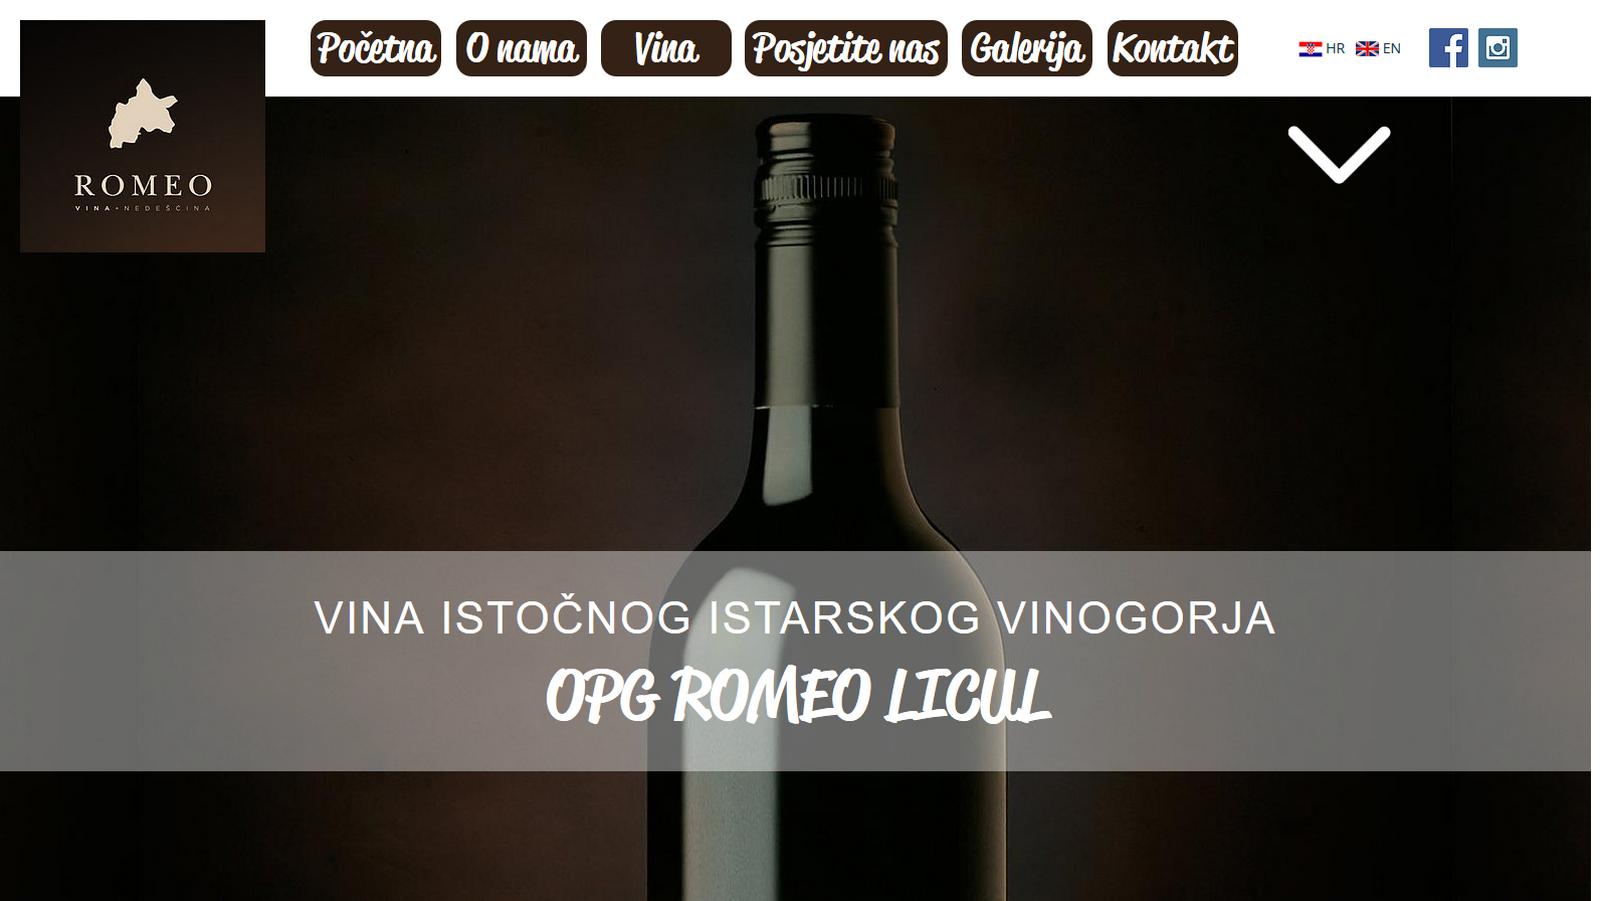 Vina Romeo